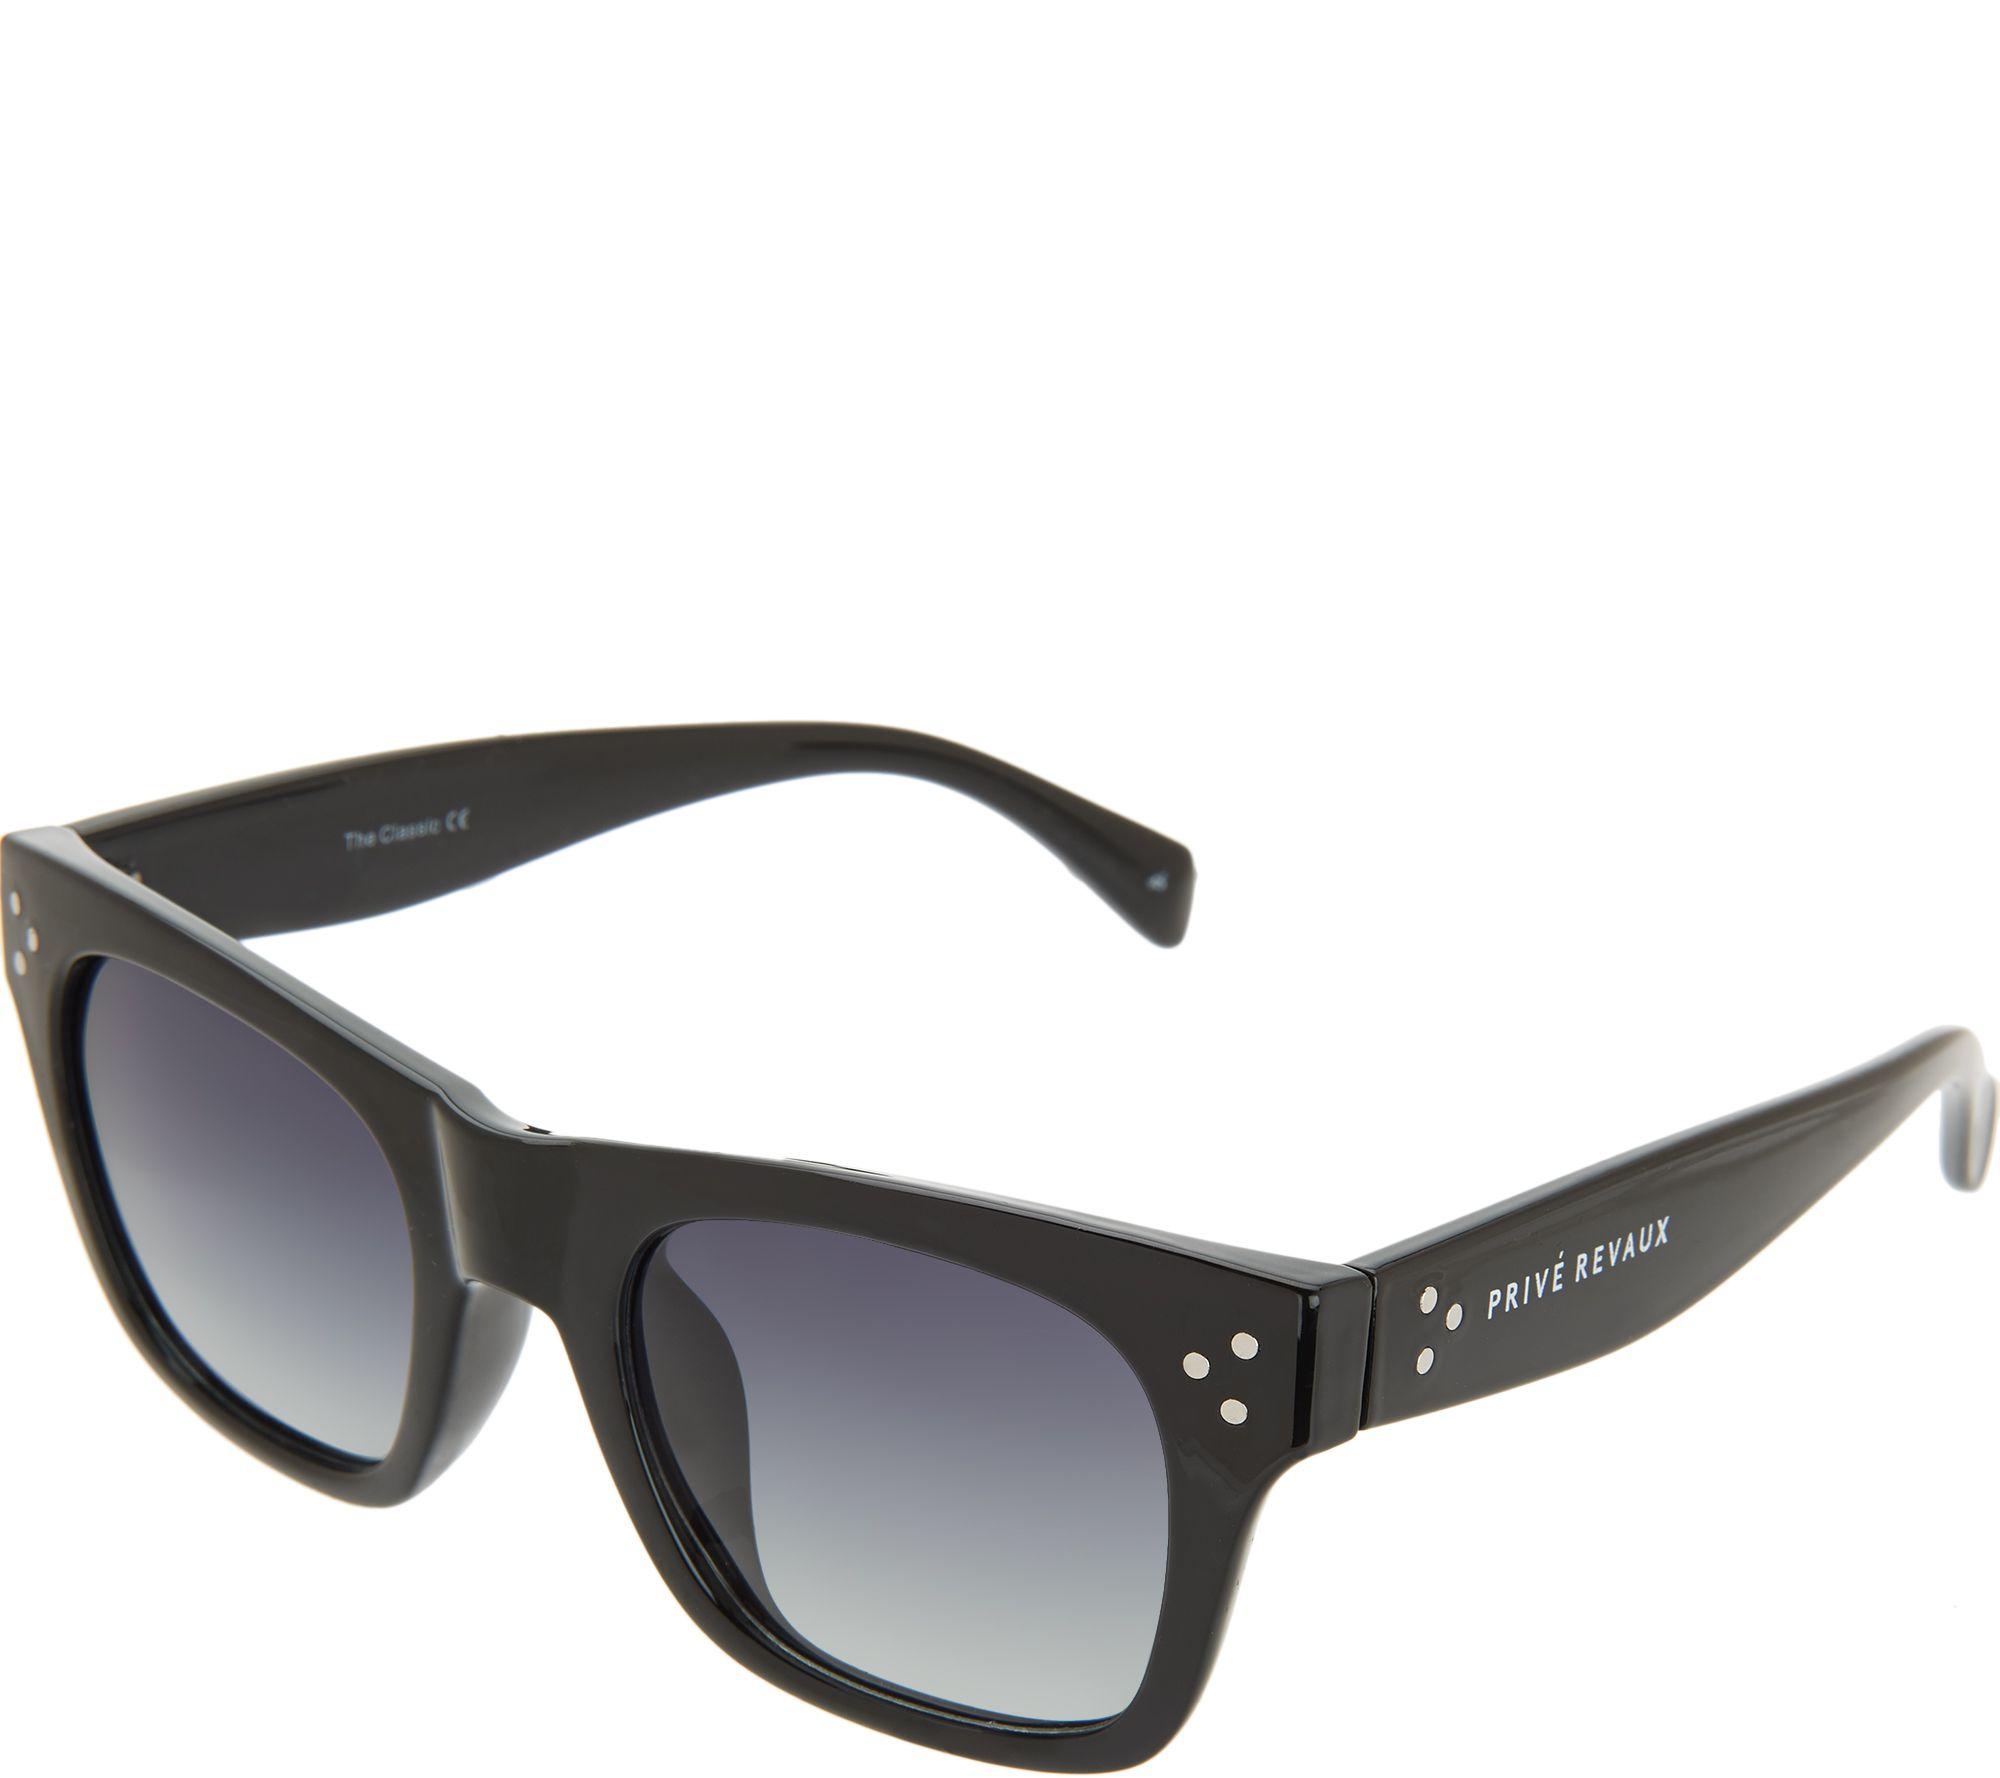 fe02790d9c Prive Revaux The Classic Polarized Sunglasses - Page 1 — QVC.com